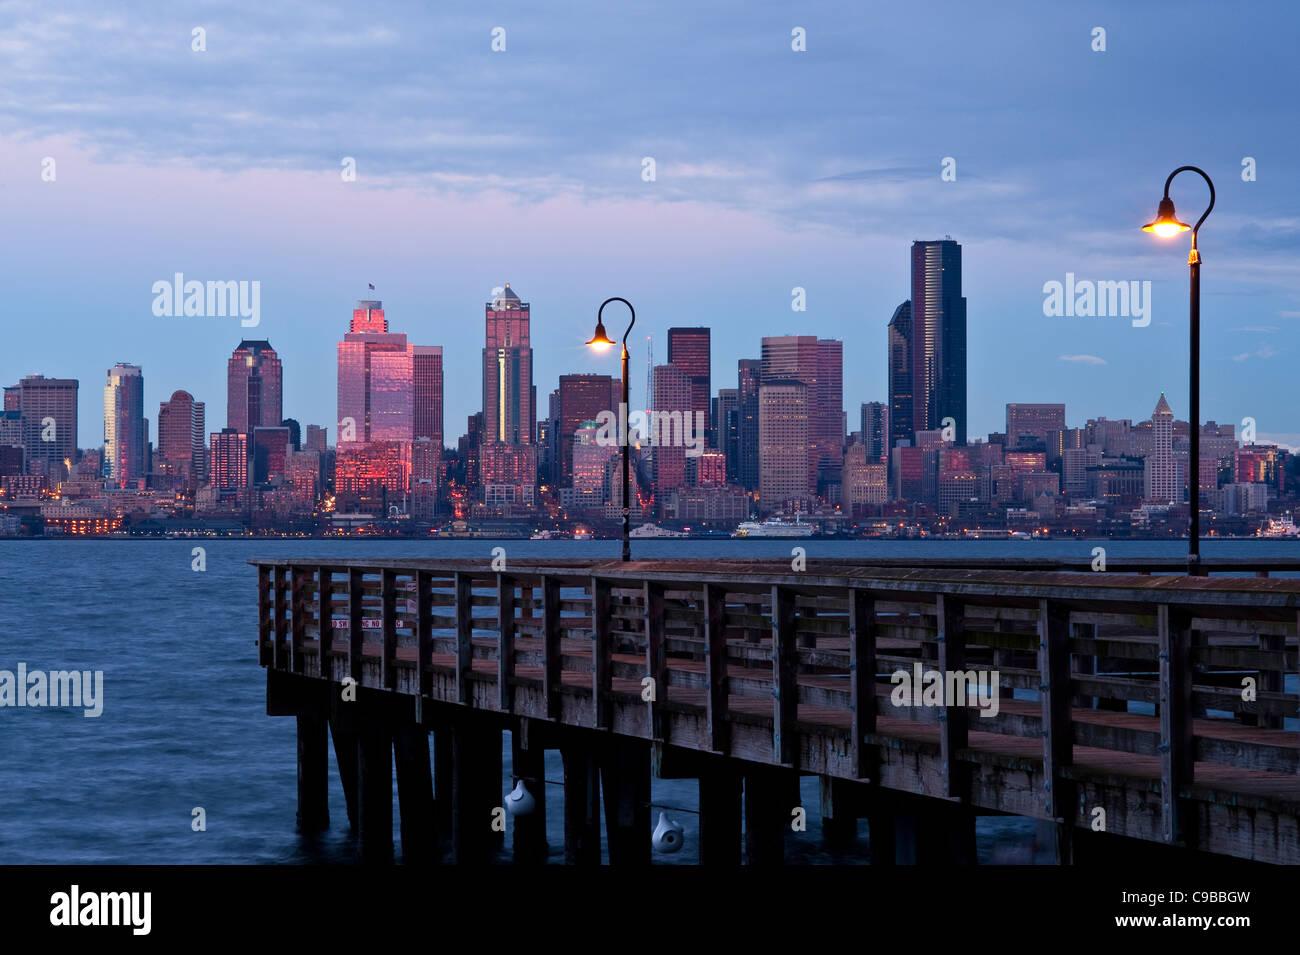 Urban fishing stock photos urban fishing stock images for Seattle fishing pier